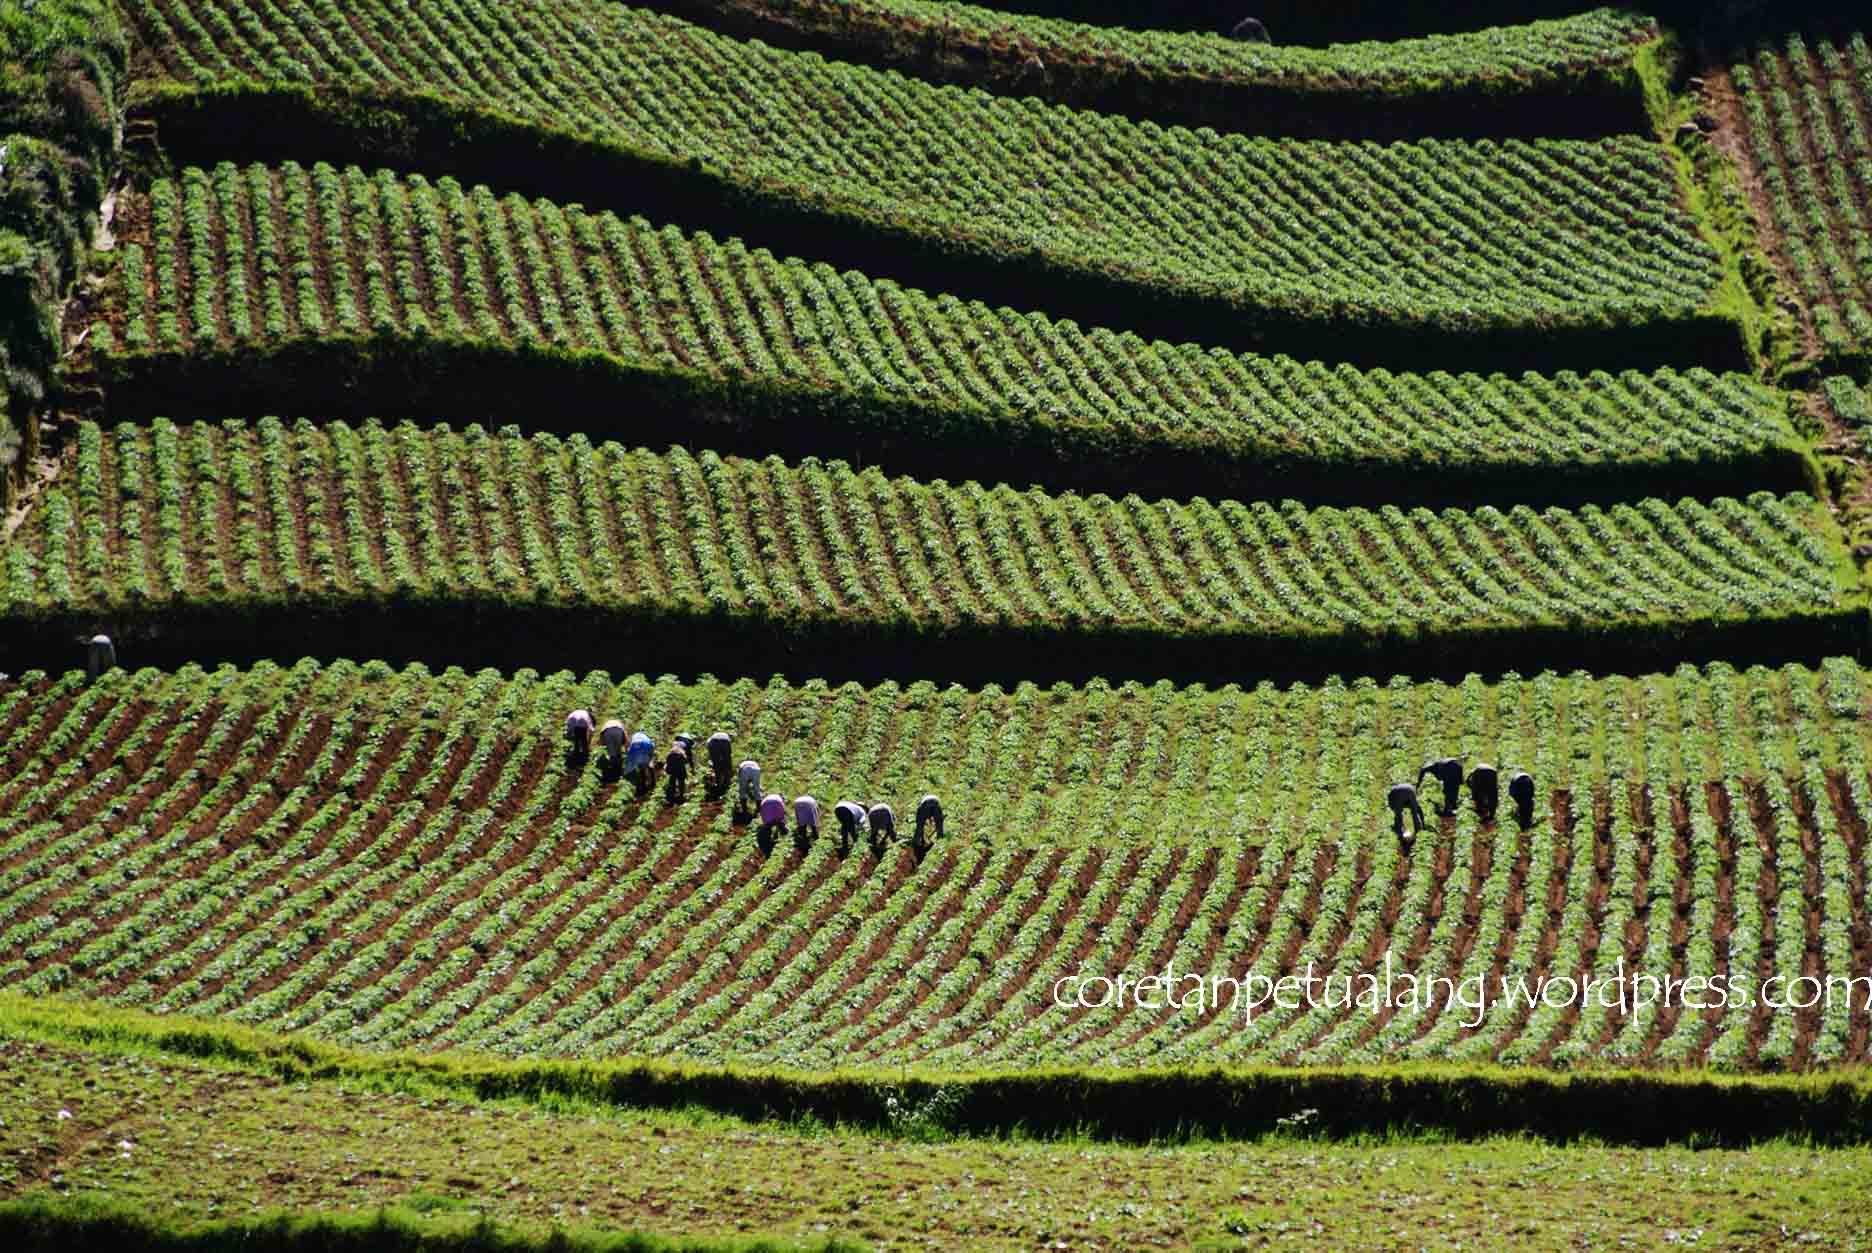 From Dieng Plateau with Love : Season 3 (Masyarakat Dieng) | coretanpetualang's Blog